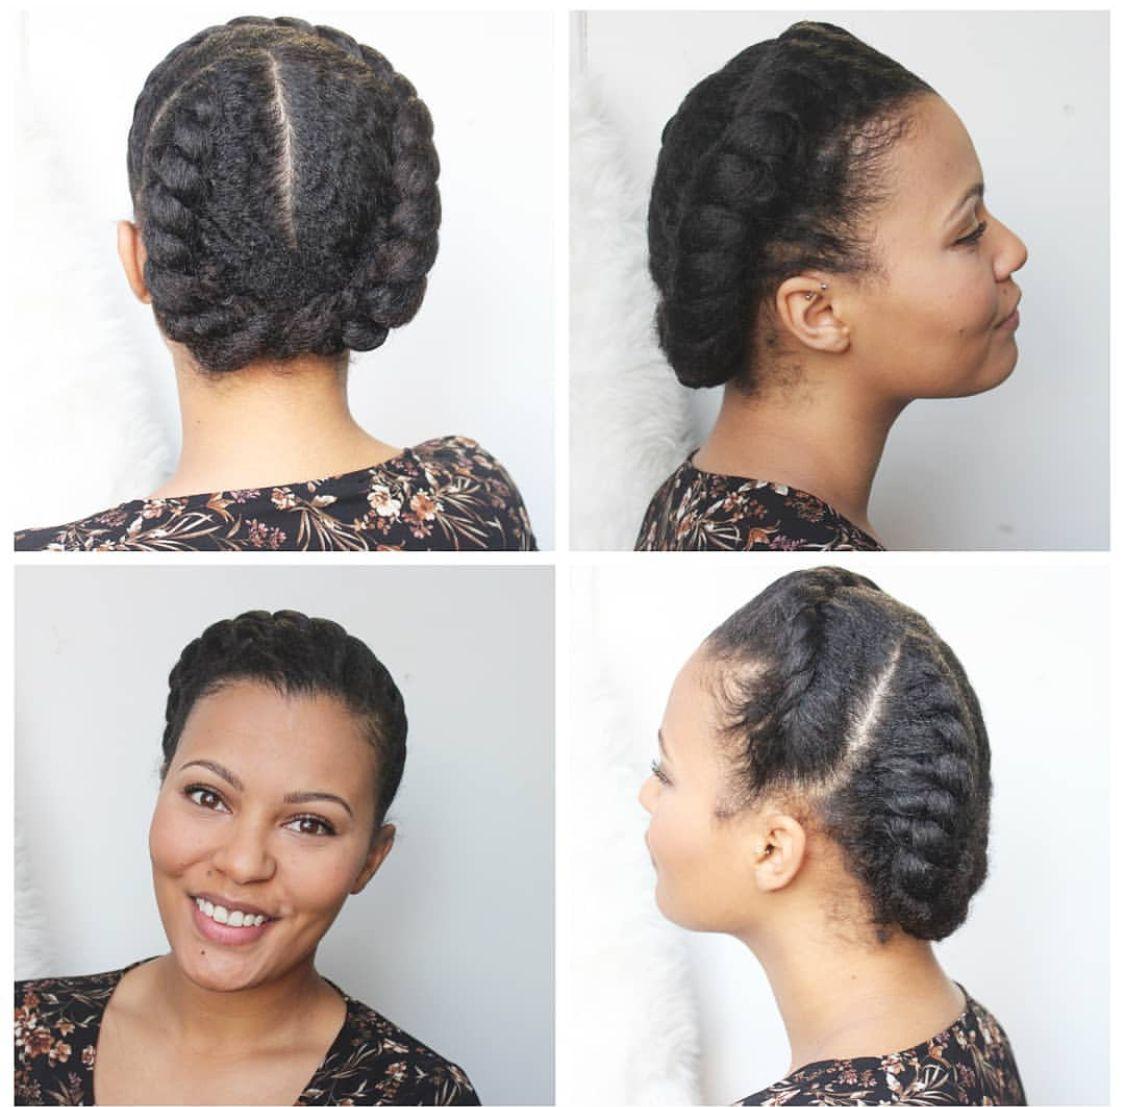 Natural black hairstyles for women hairstyleforblackwomen.net 23